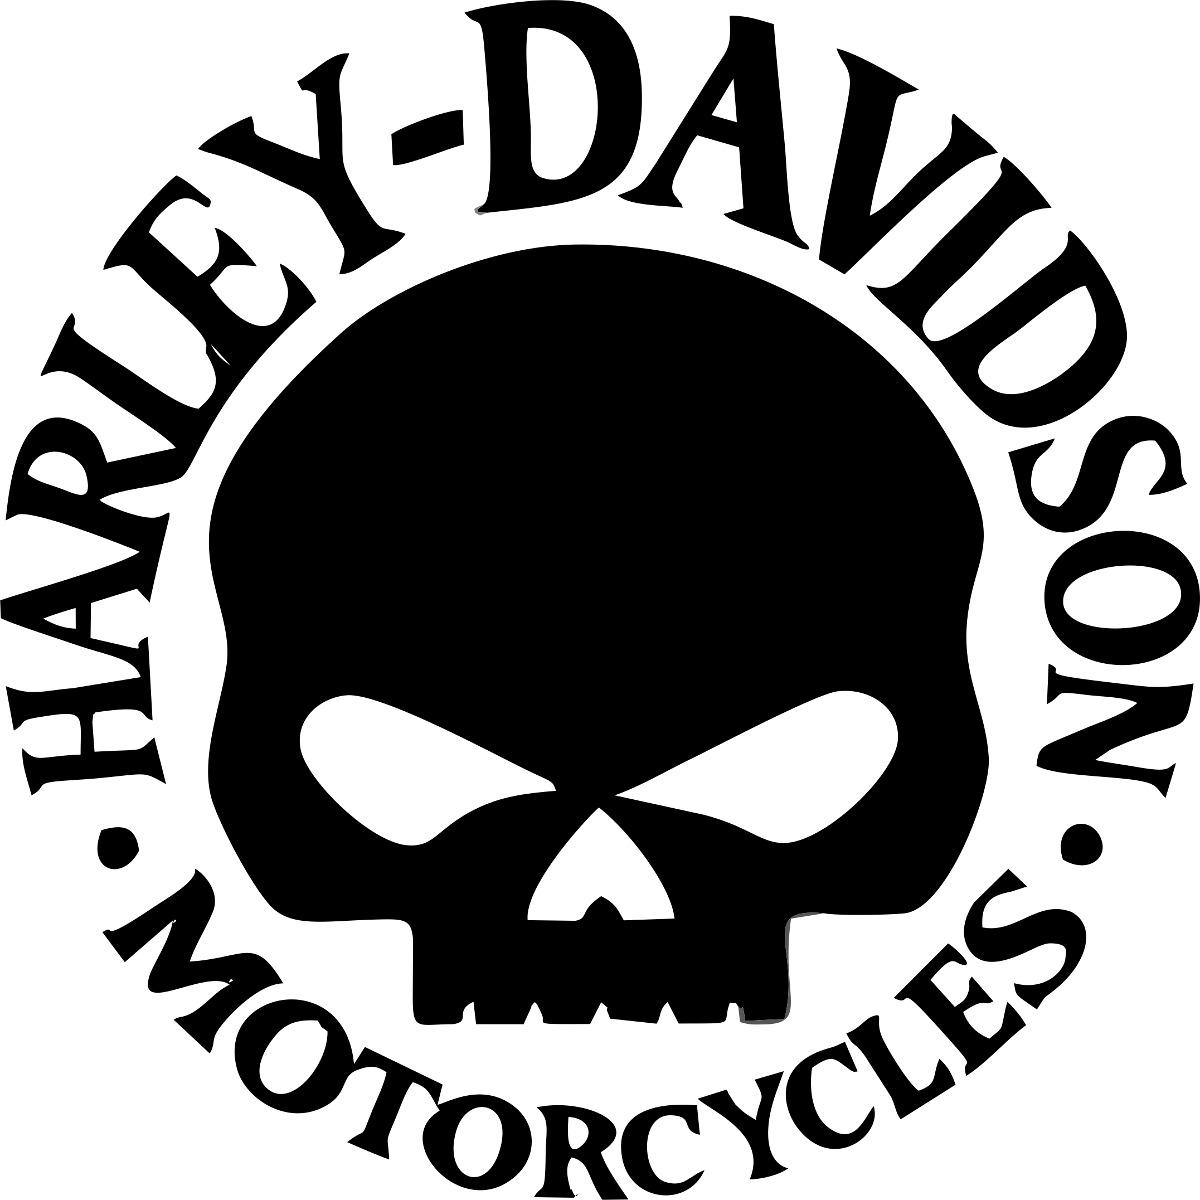 Harley Davidson Motorcycles Skull Logo